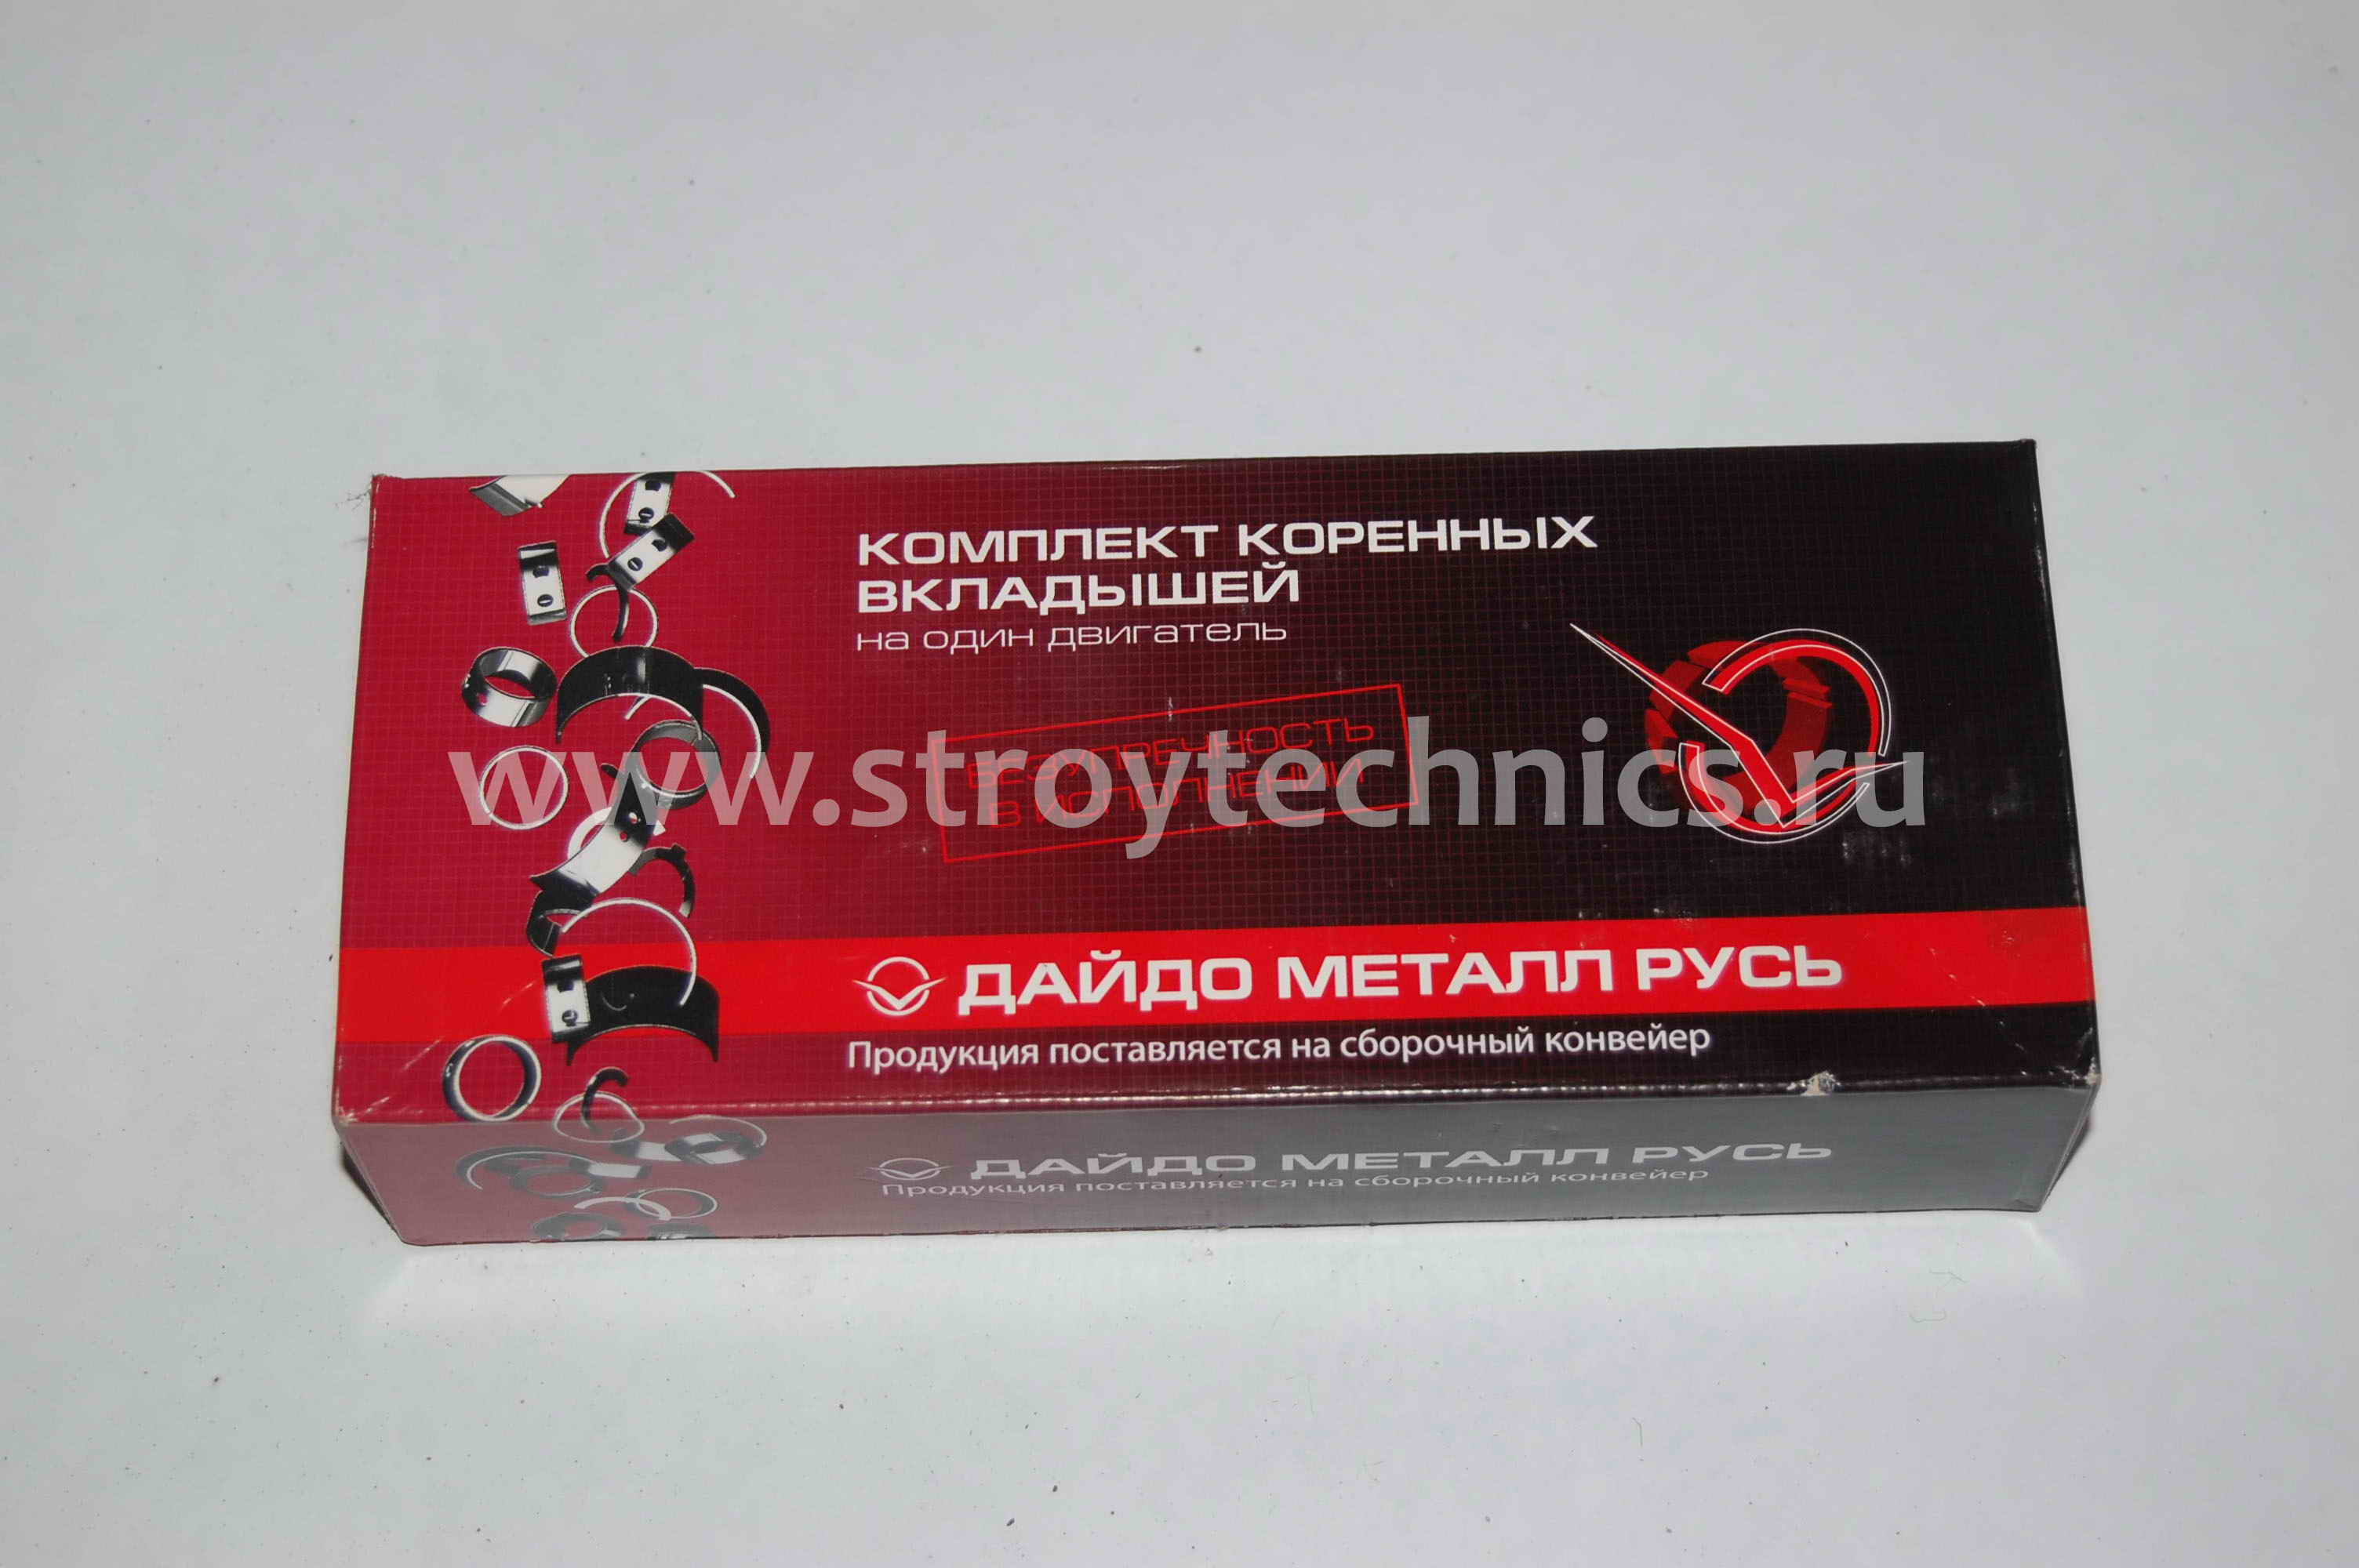 Вкладыши коренные Д-245.12С ГАЗ-34039, ГАЗ-71, ТТМ, ЗЗГТ, ГТСМ